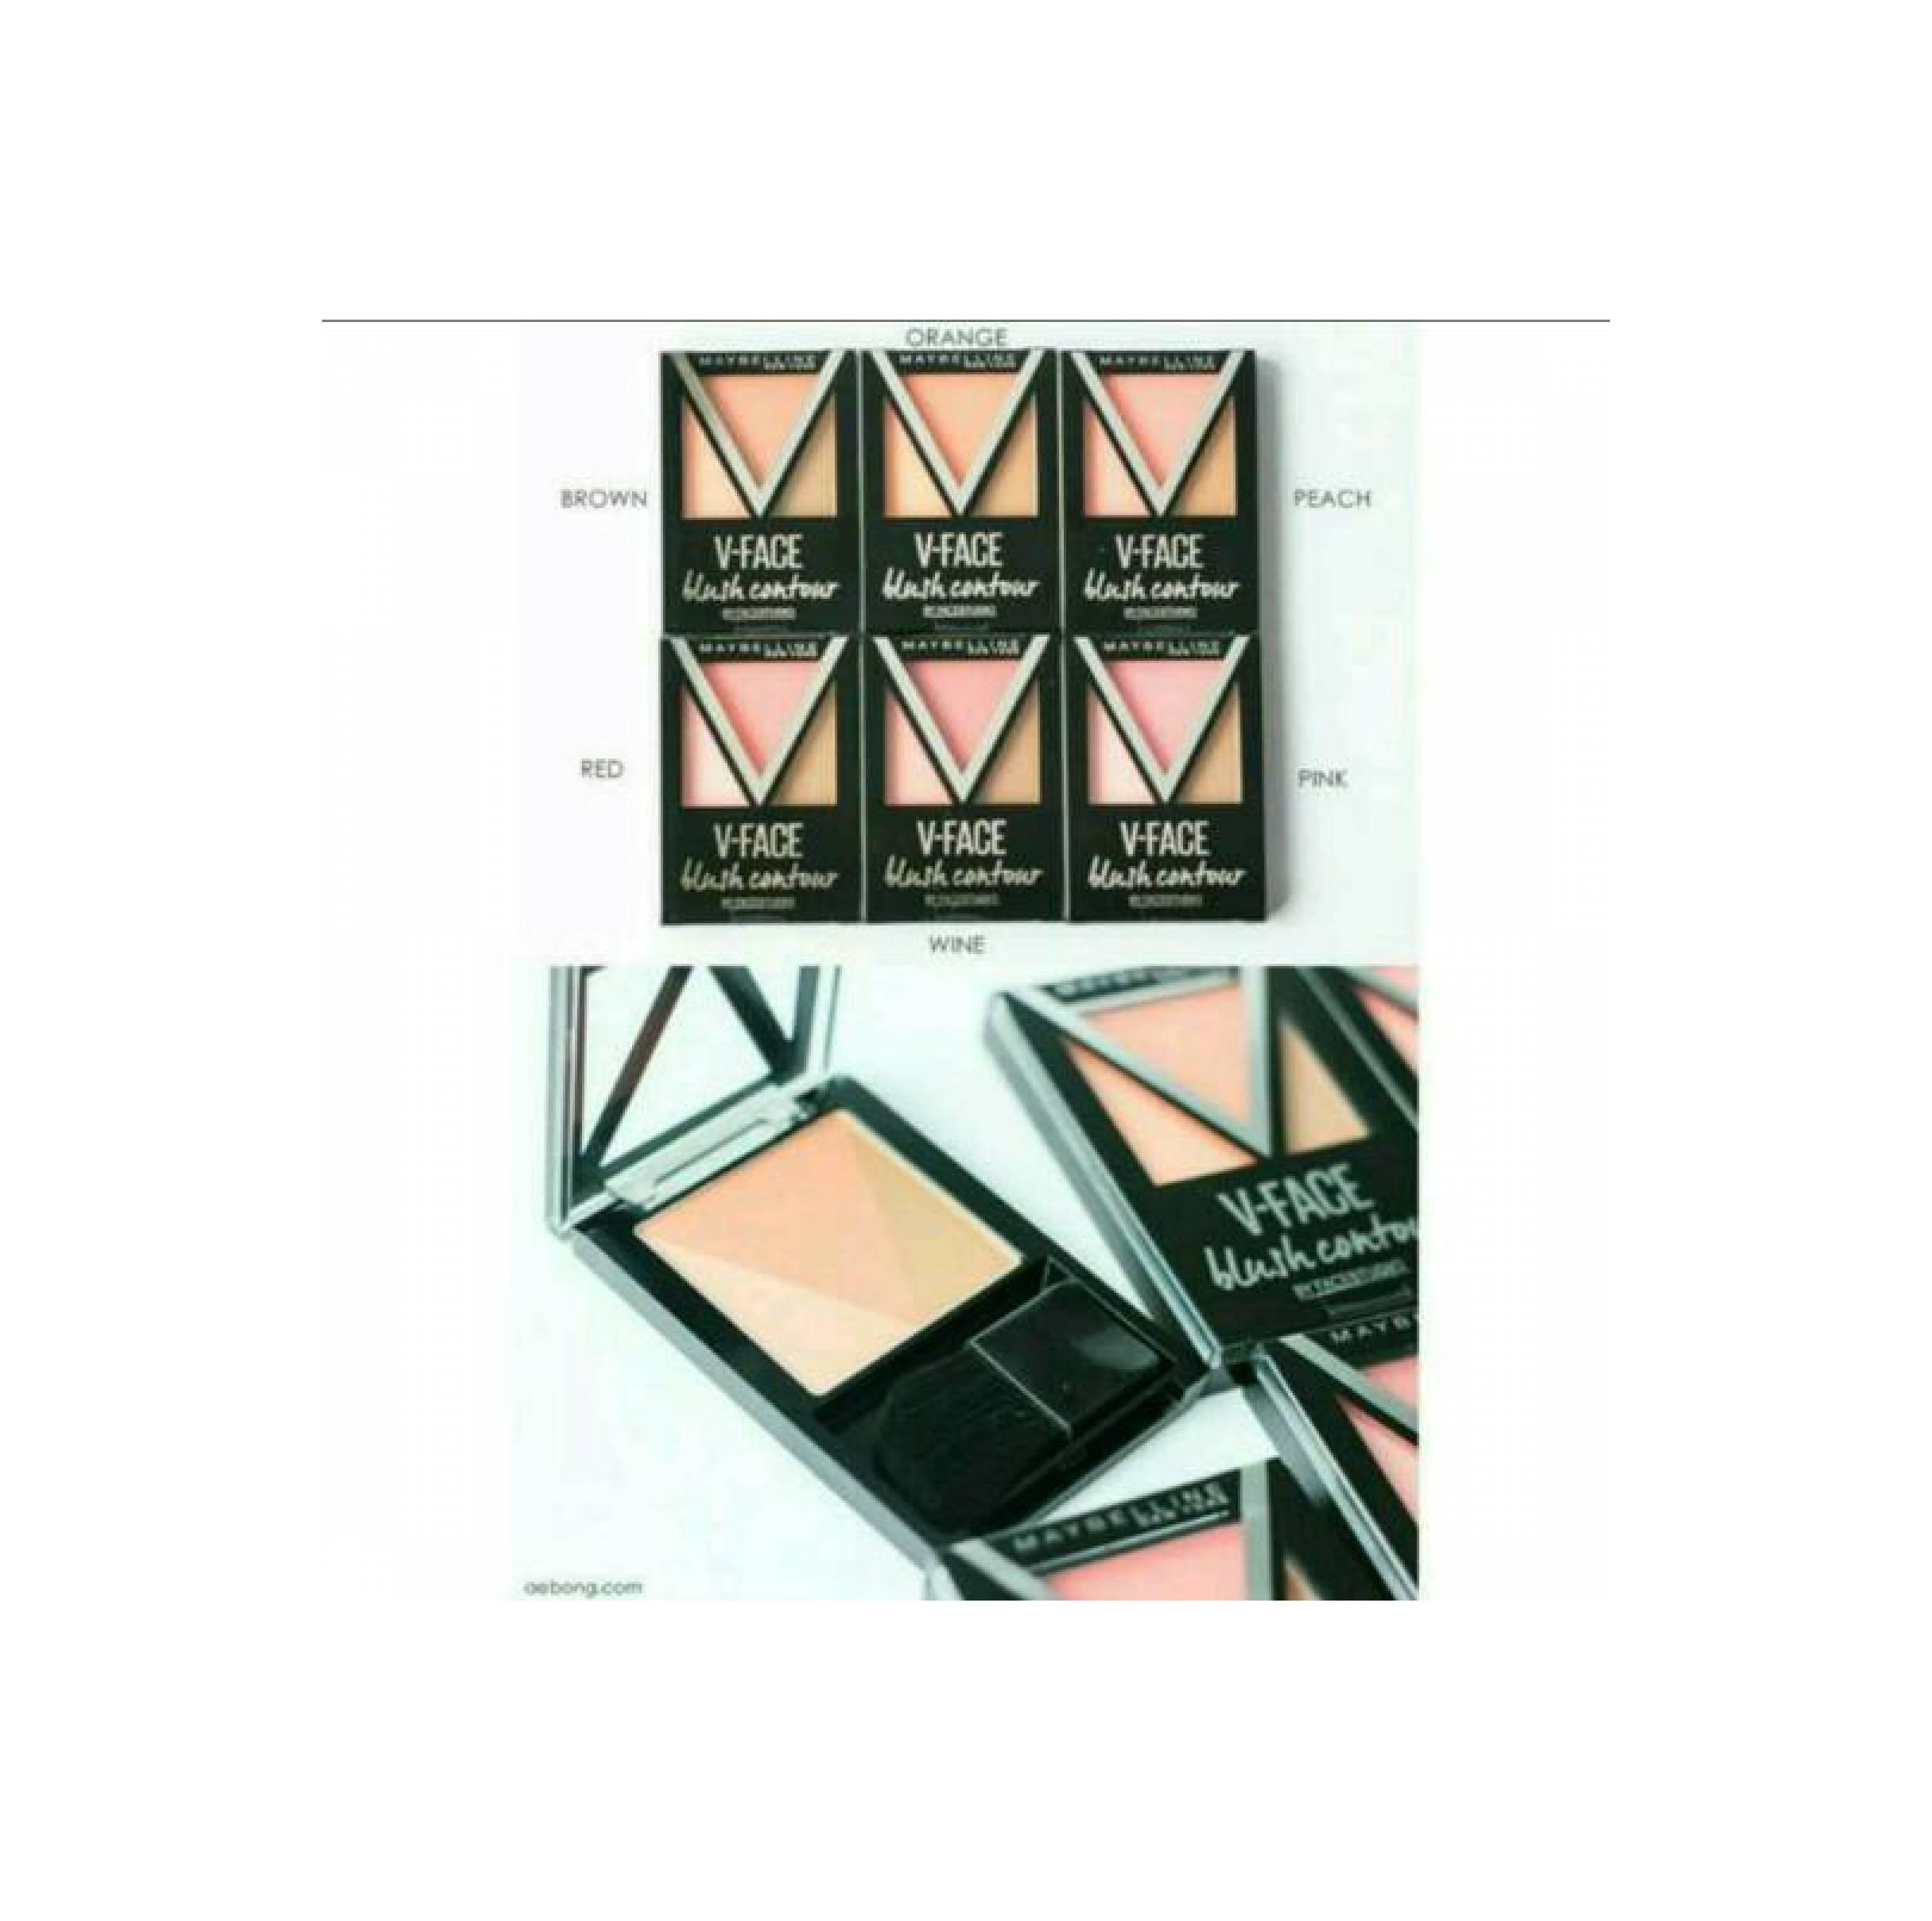 Perbandingan Harga Maybelline V Face Blush Contour Pink Meyne